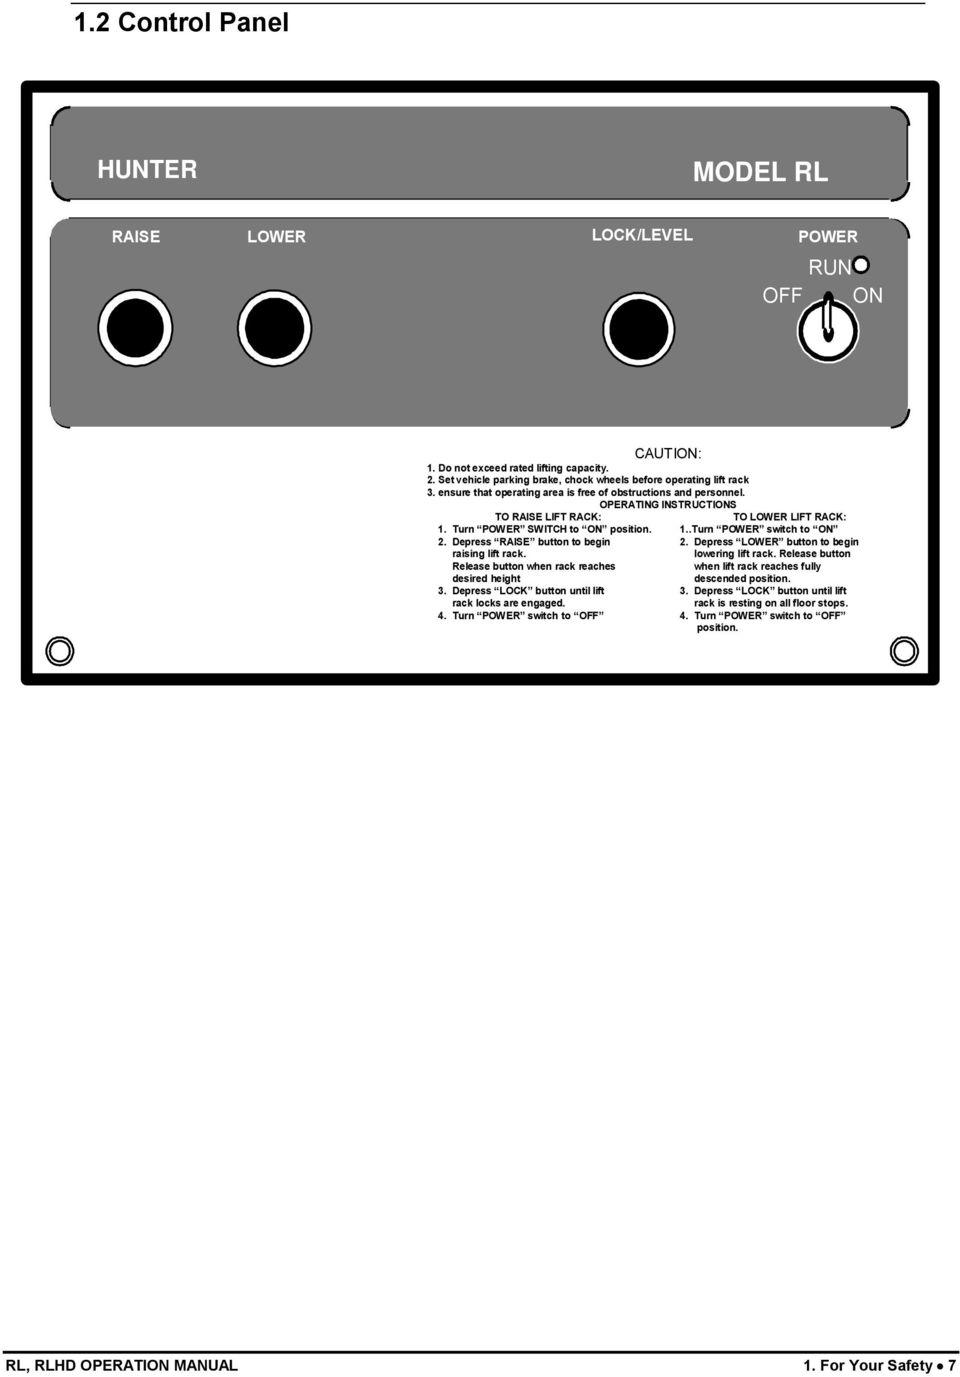 hight resolution of depress raise button to begin raising lift rack release button when rack reaches desired height